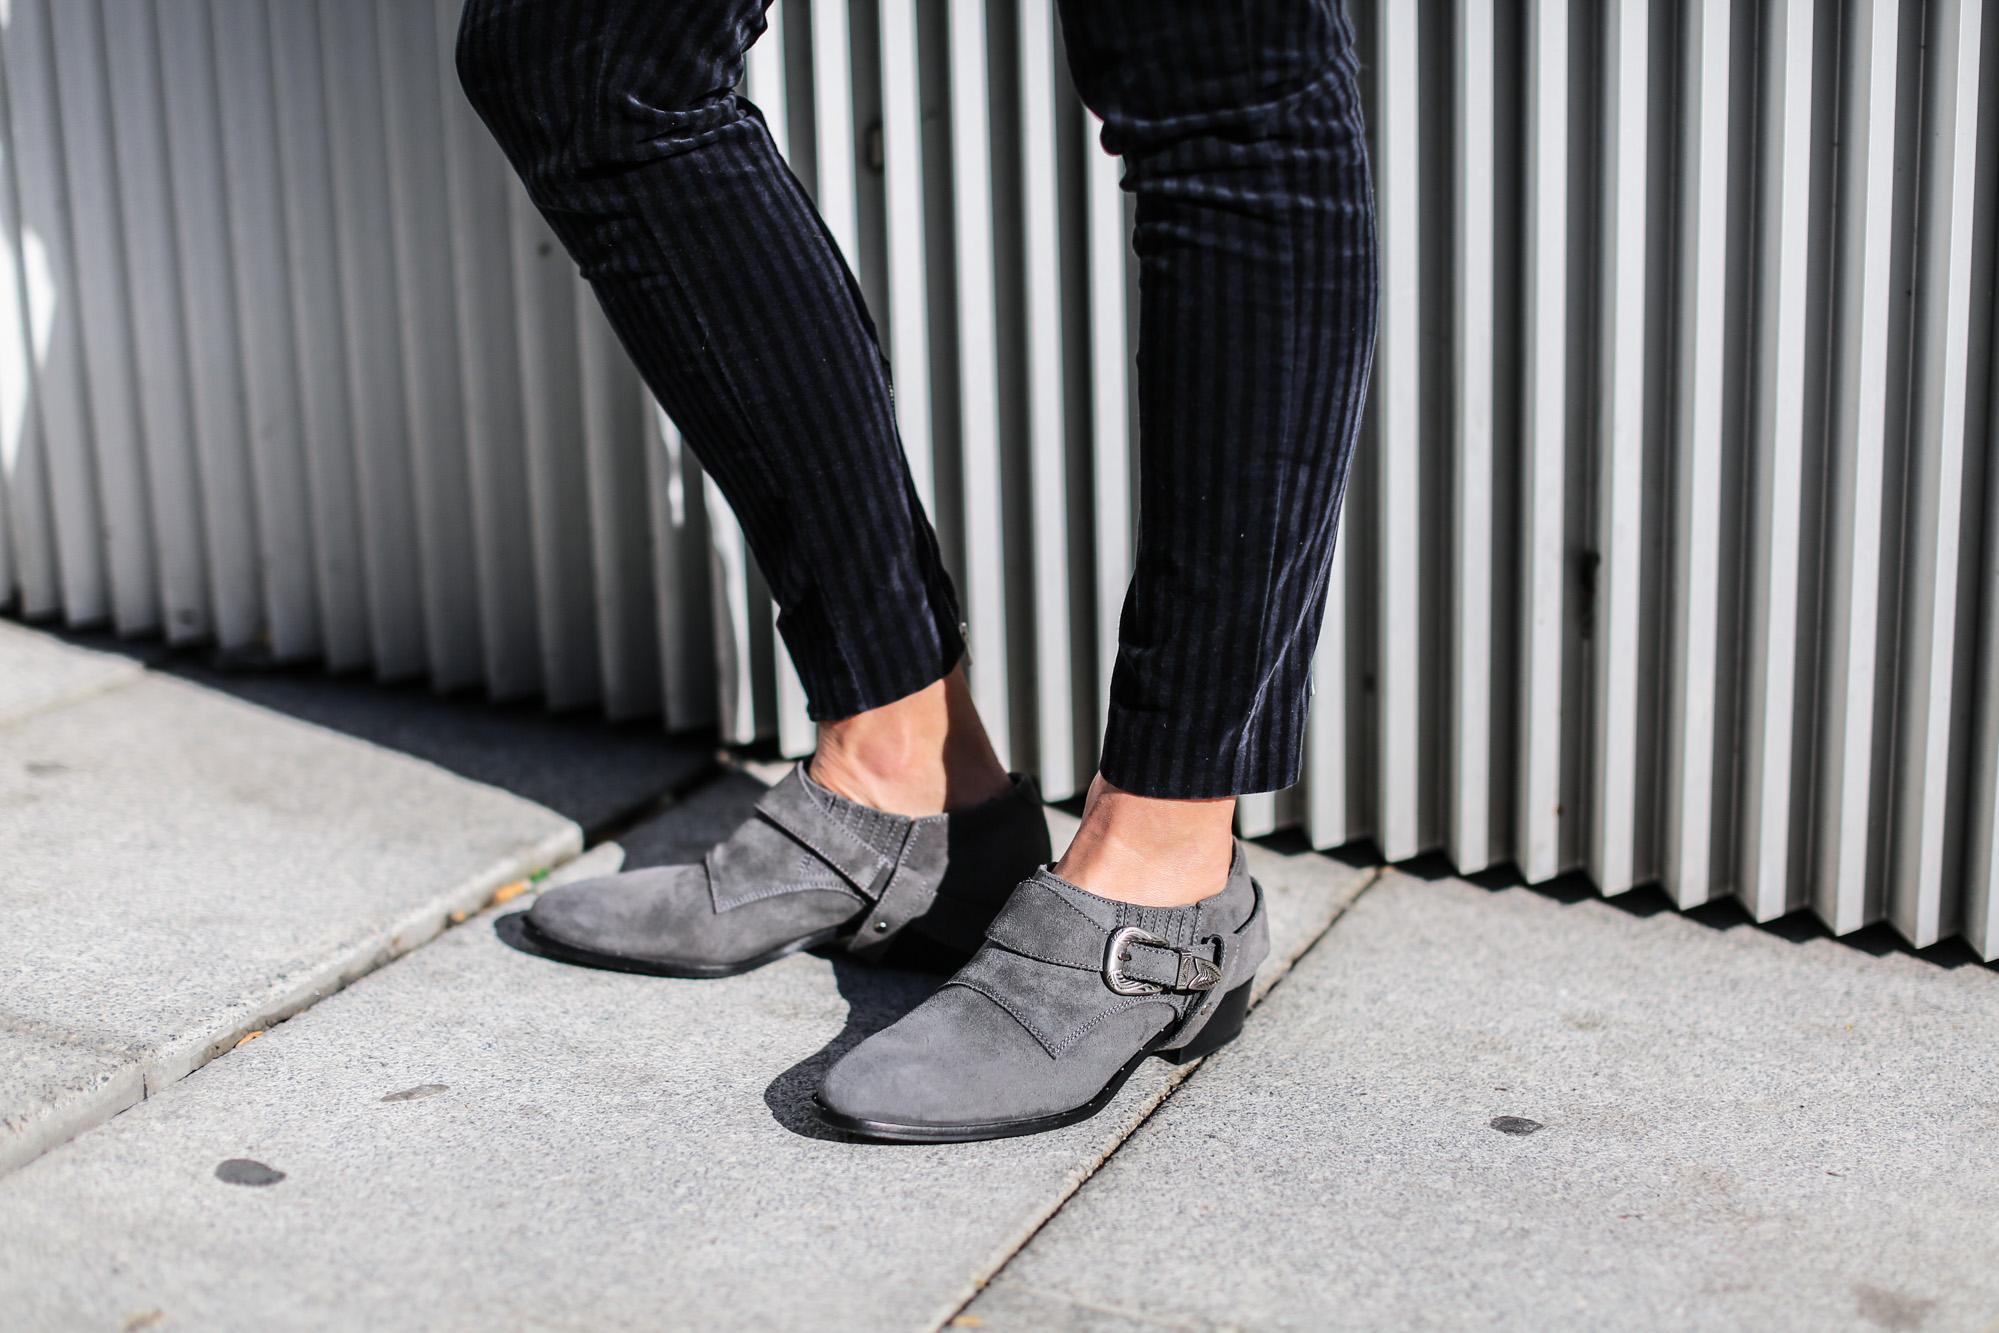 Clochet_streetstyle_muitt_madrid_zapatos_oxford_abrigo_masscob_lacoruña_trimmerbilbao-11